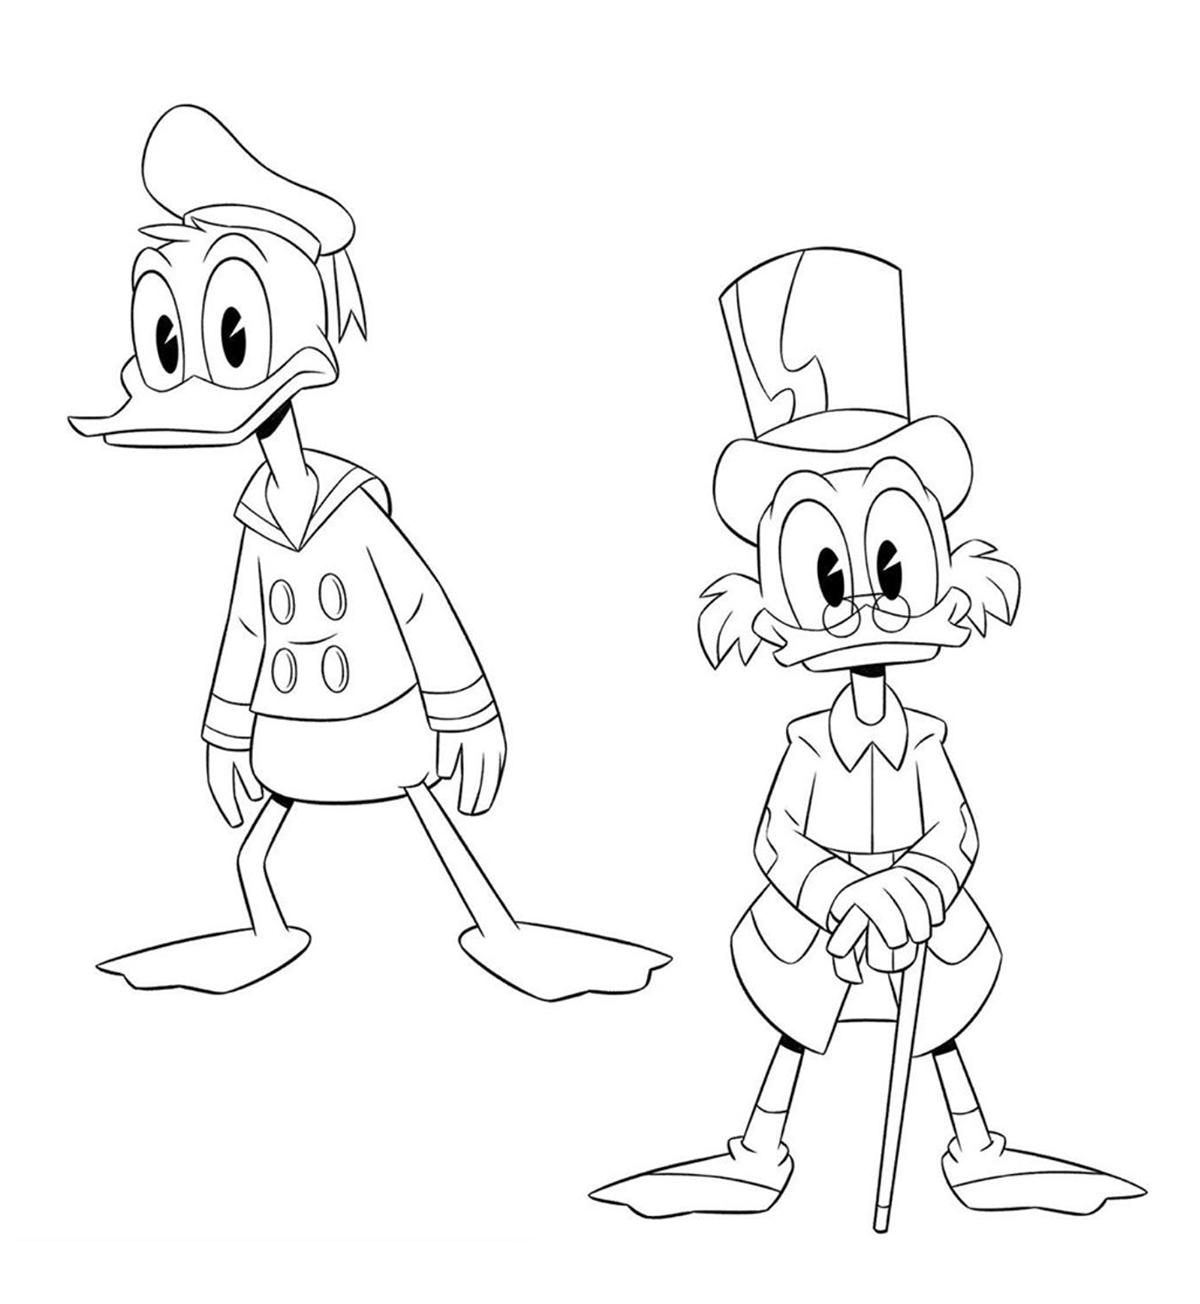 DuckTalesNew - 3.jpg